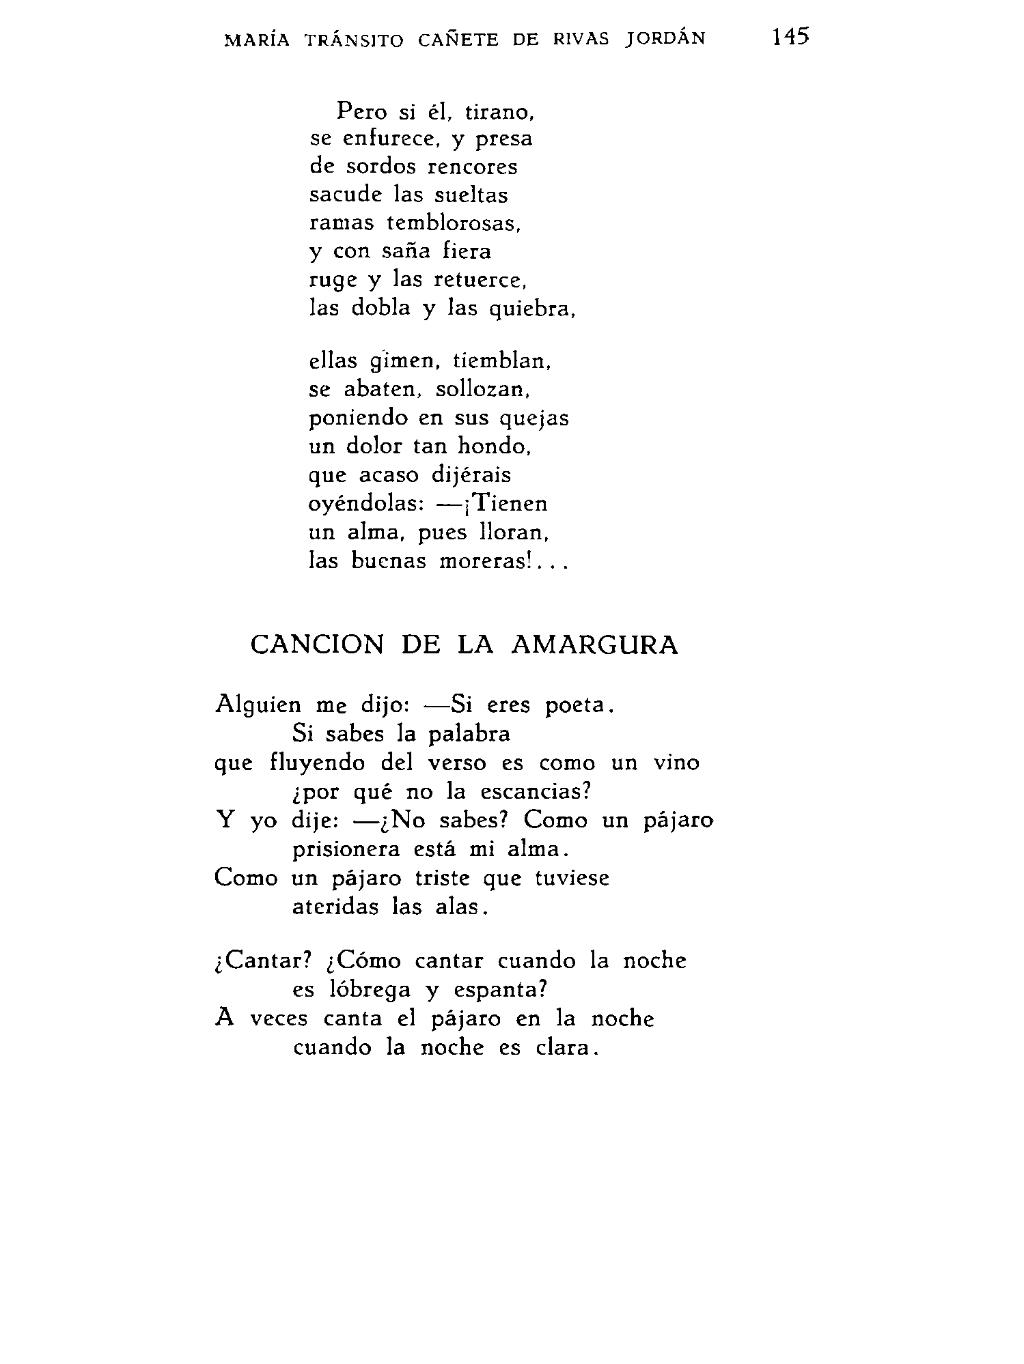 Página:Antologia Poesia Femenina Argentina djvu/143 - Wikisource